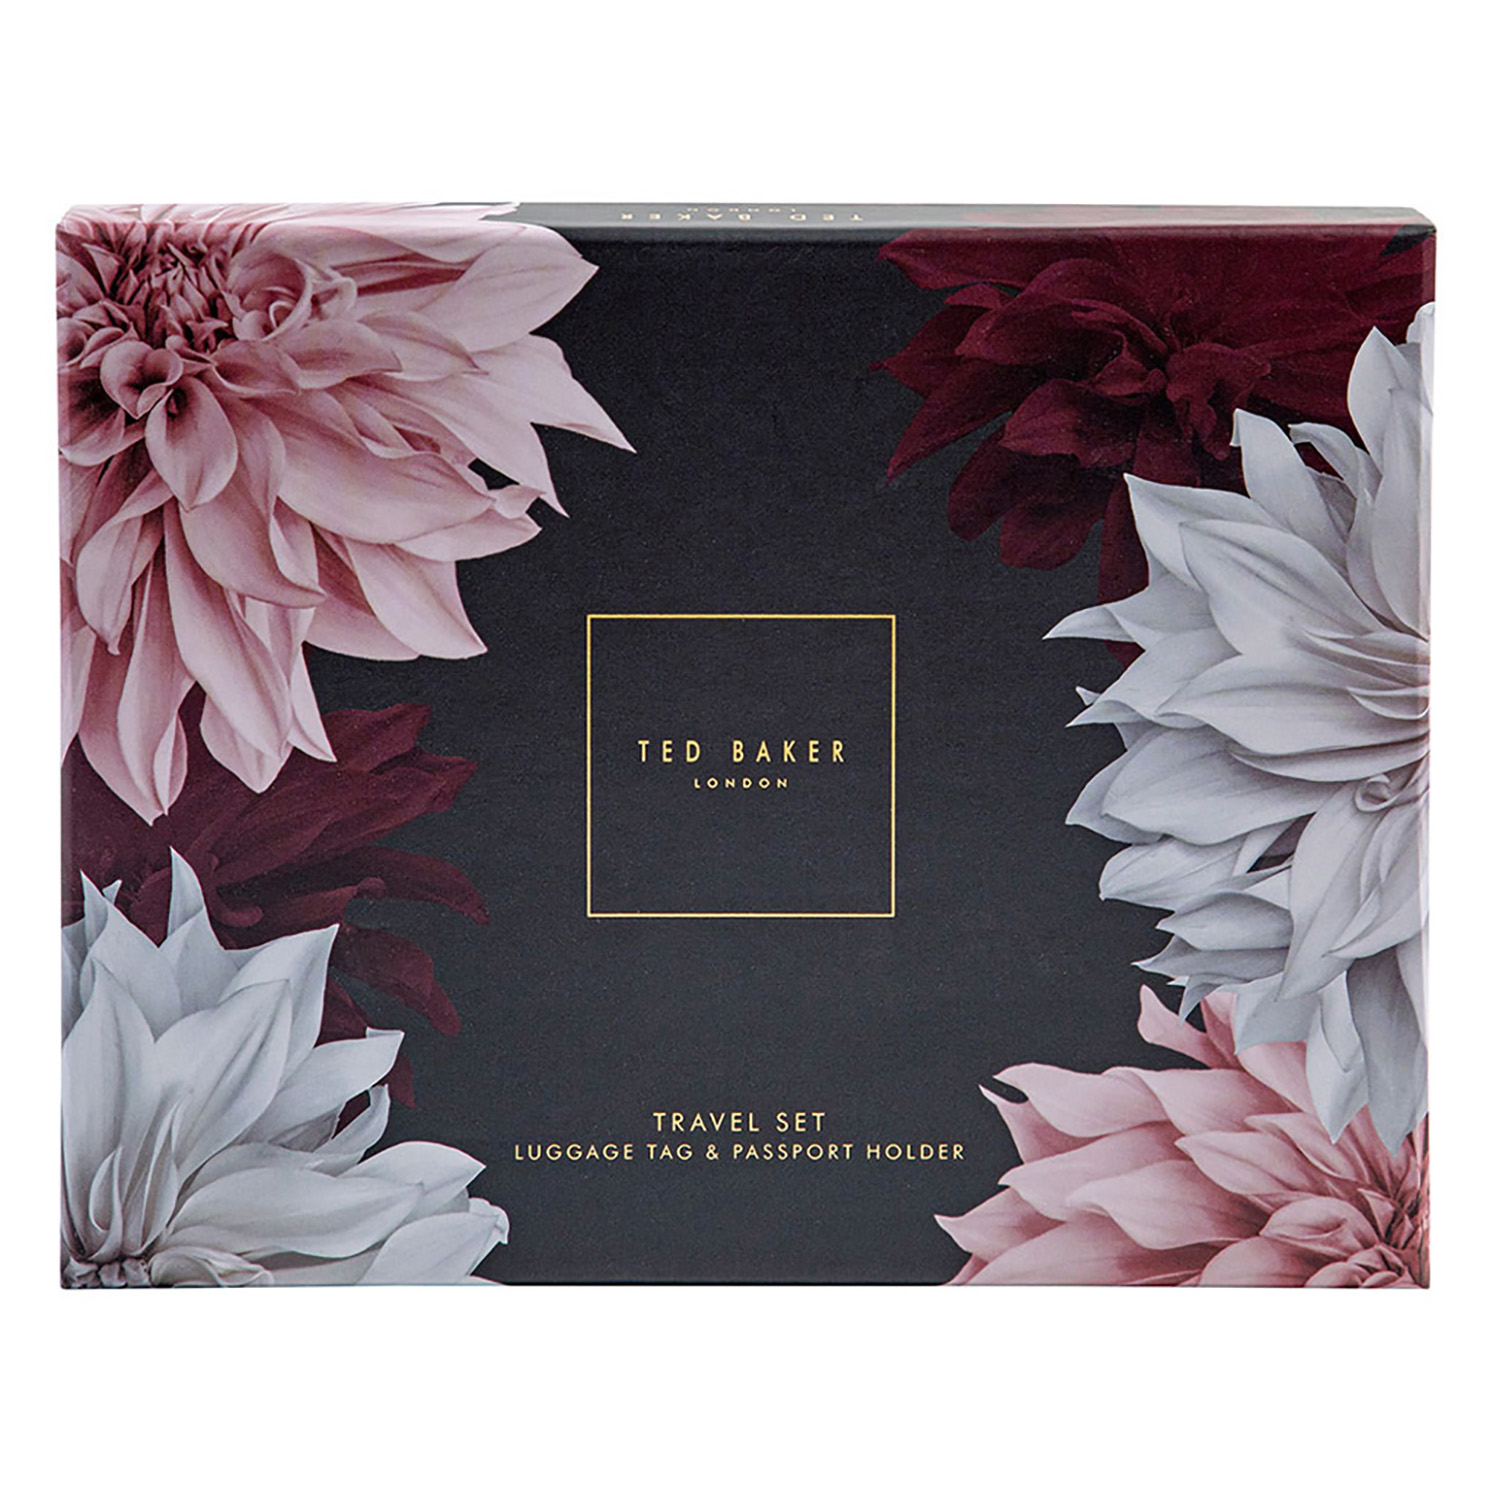 Ted Baker – Clove Travel Set in Presentation Gift Box